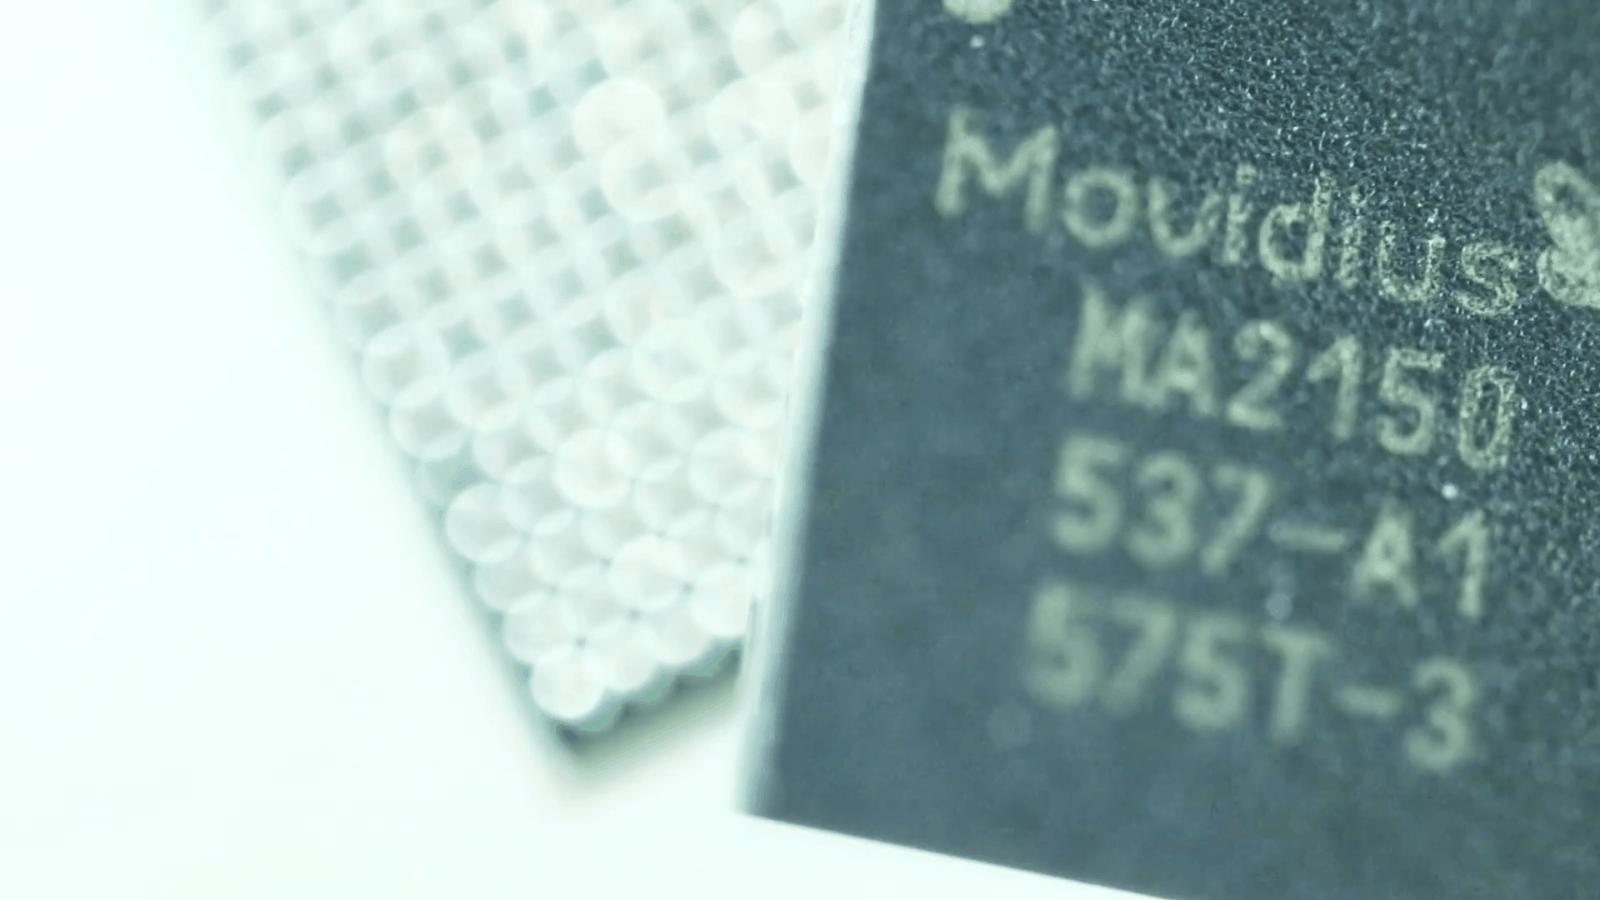 Movidius Chip